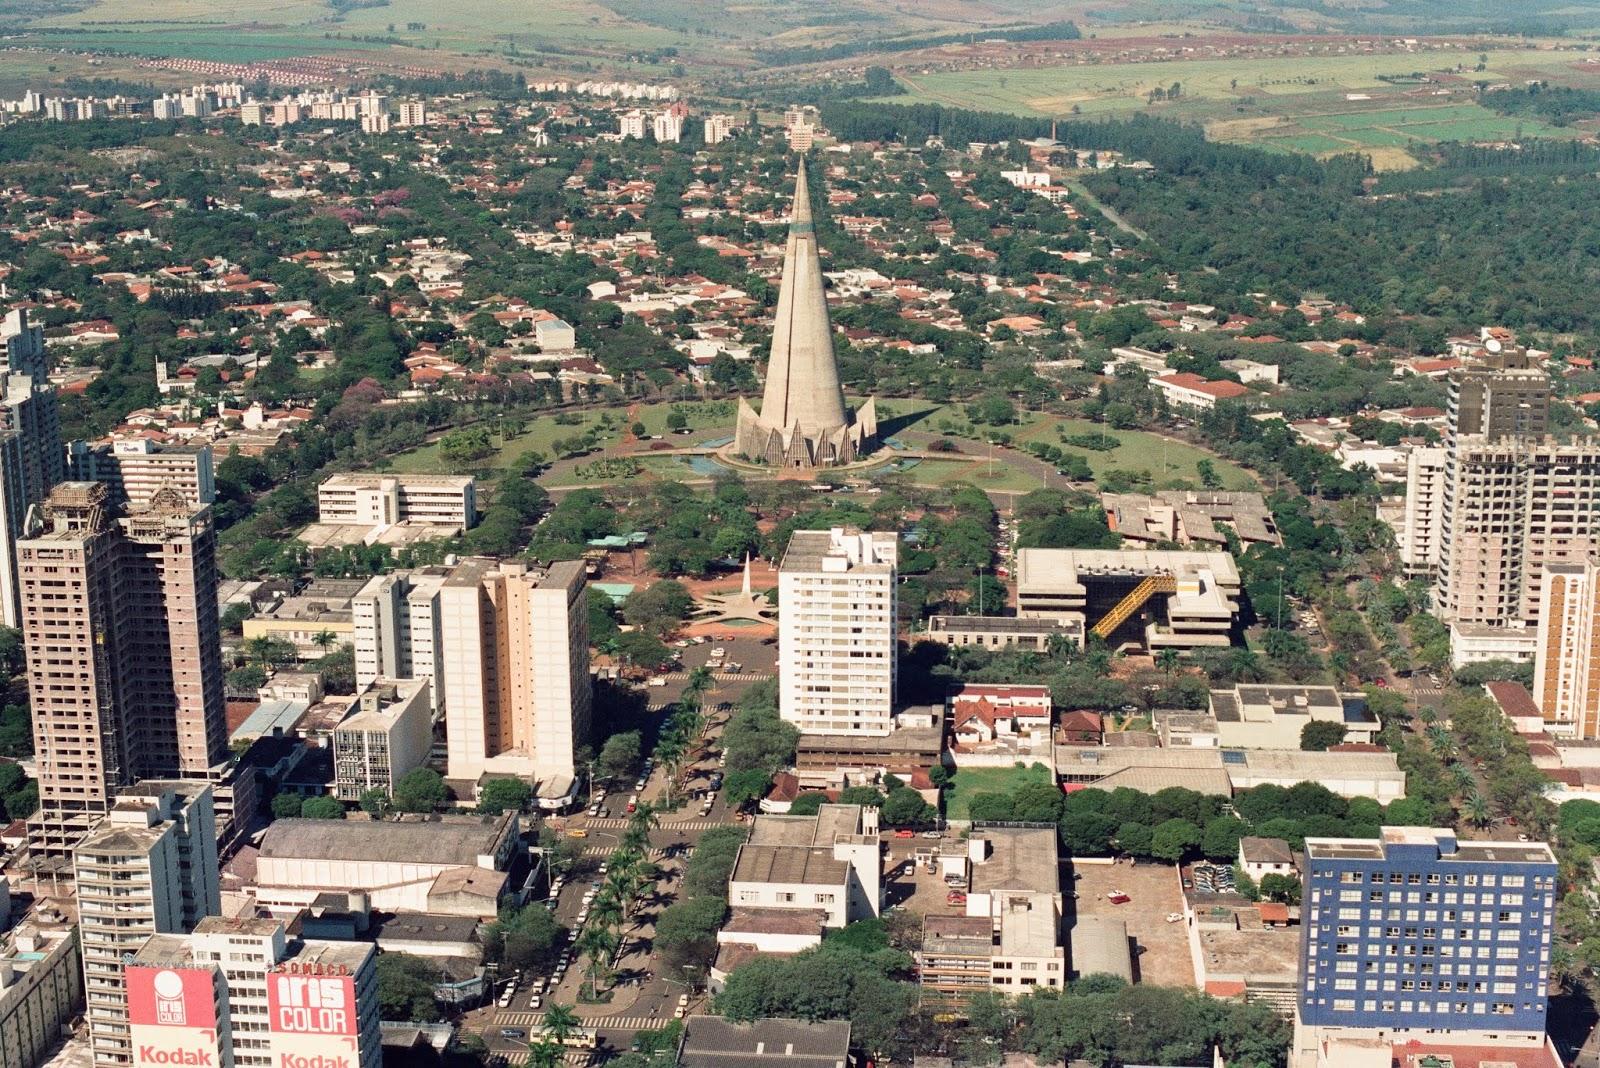 Catedral e avenida Getúlio Vargas - 1989